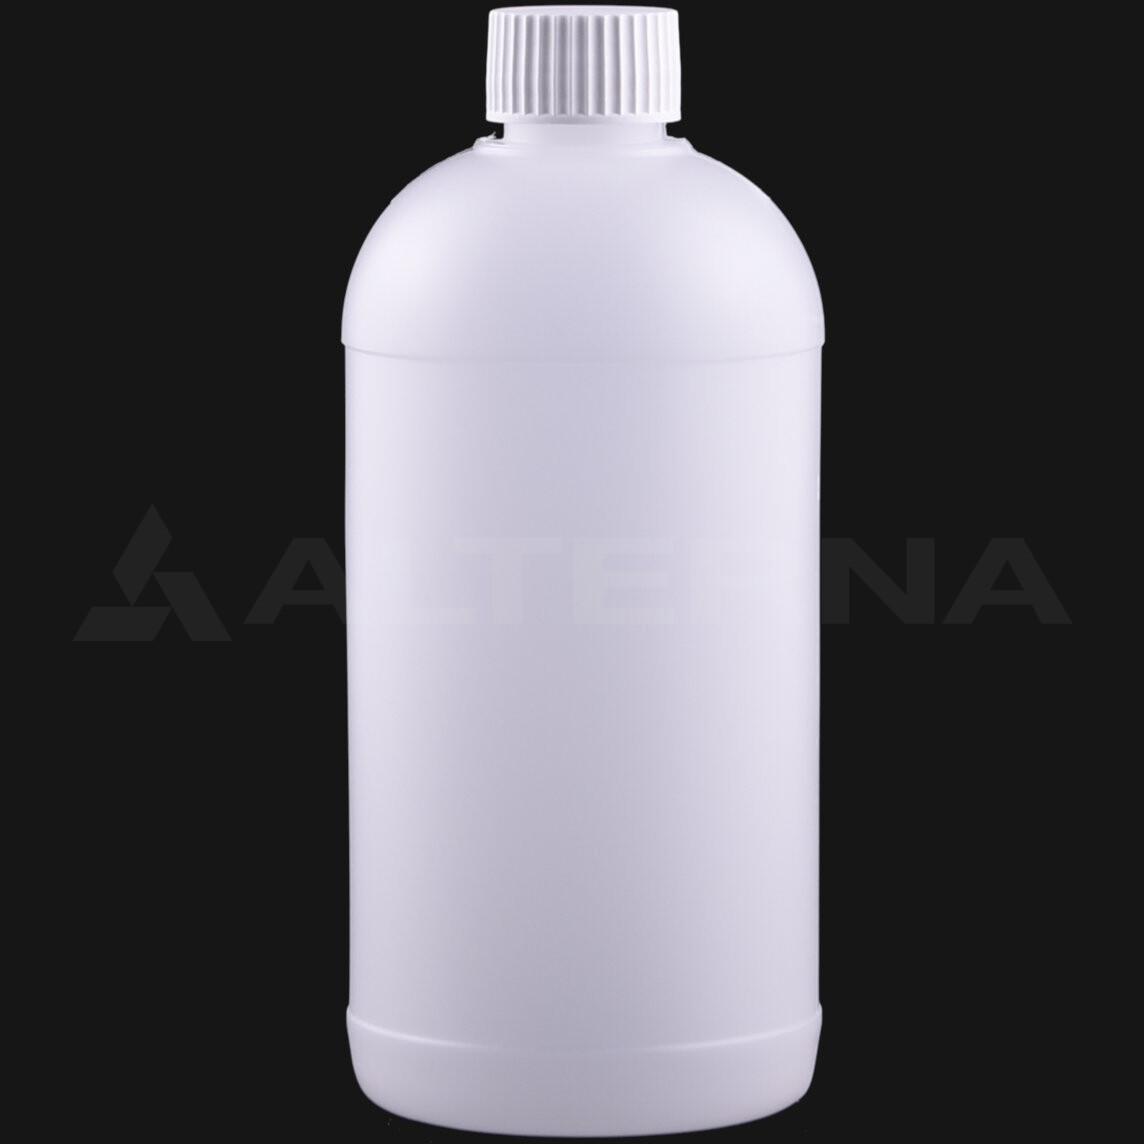 500 ml HDPE Bottle with 28 mm Foam Seal Cap